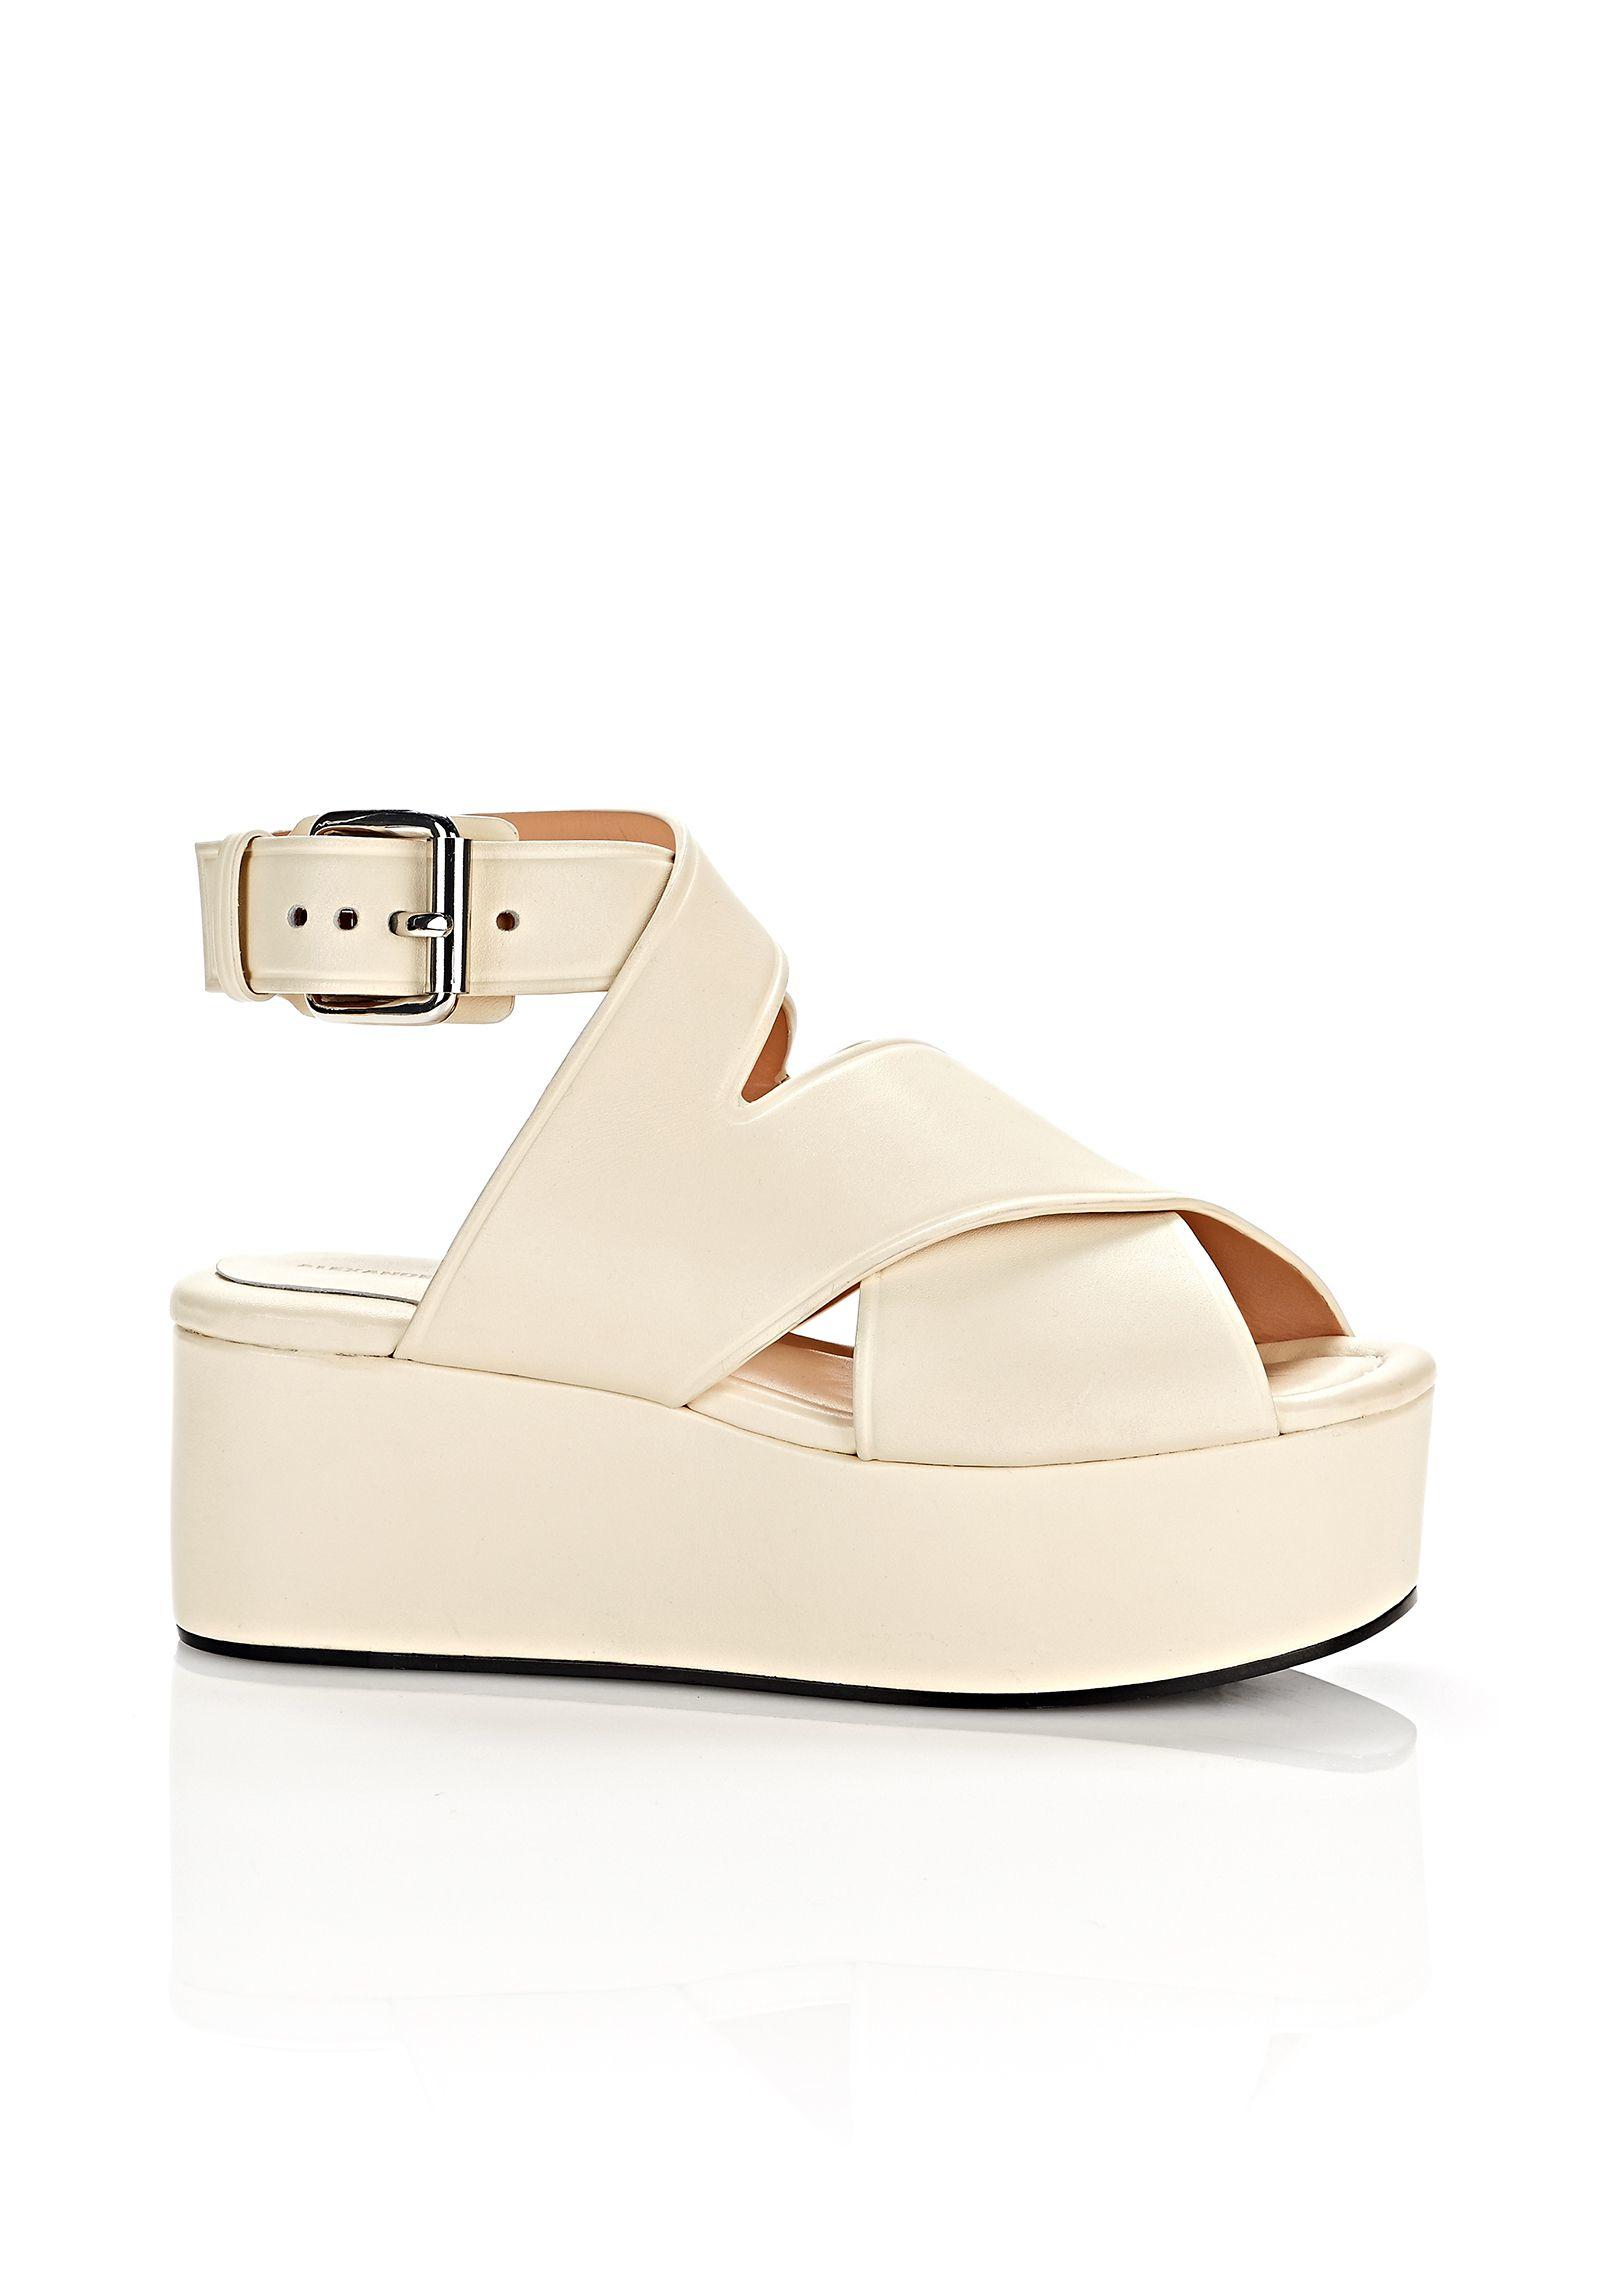 1495ce12563 Alexander Wang Rudy Flatform Sandals in Natural - Lyst